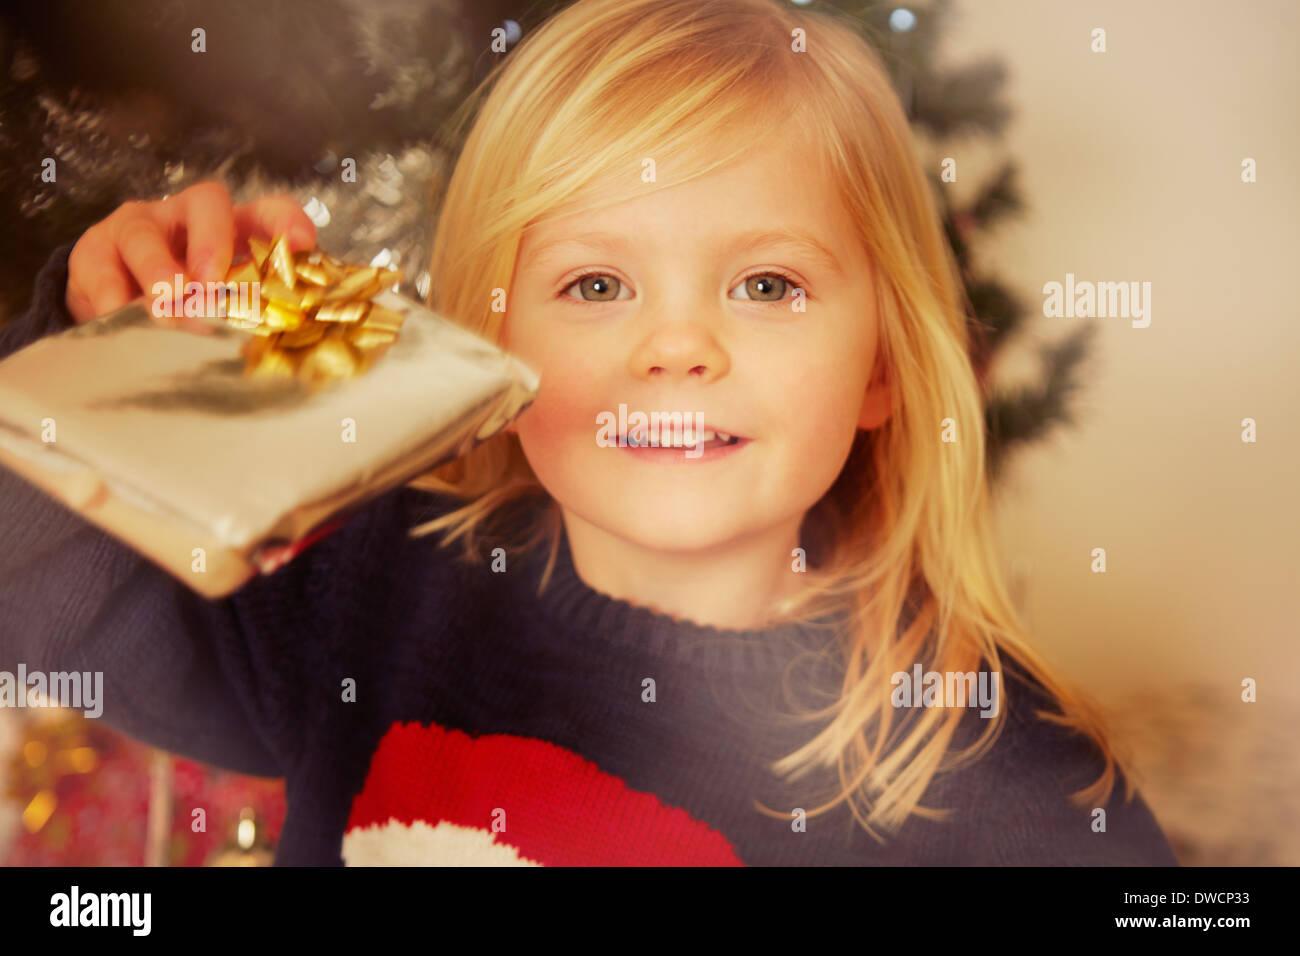 Child holding Christmas present - Stock Image